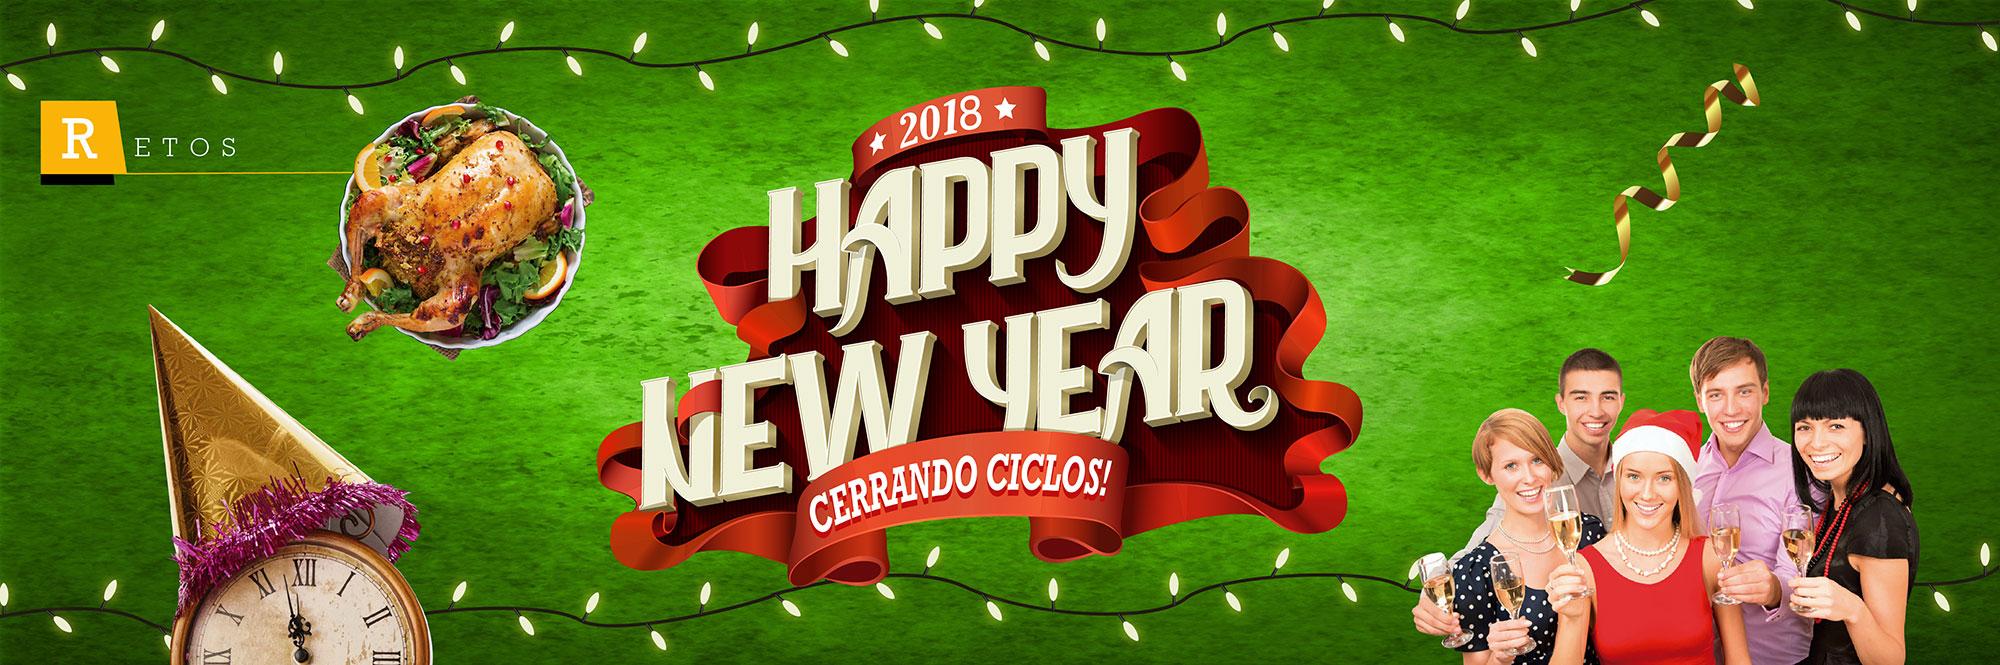 Happy New Year Avisos Efectivos Dic 2017